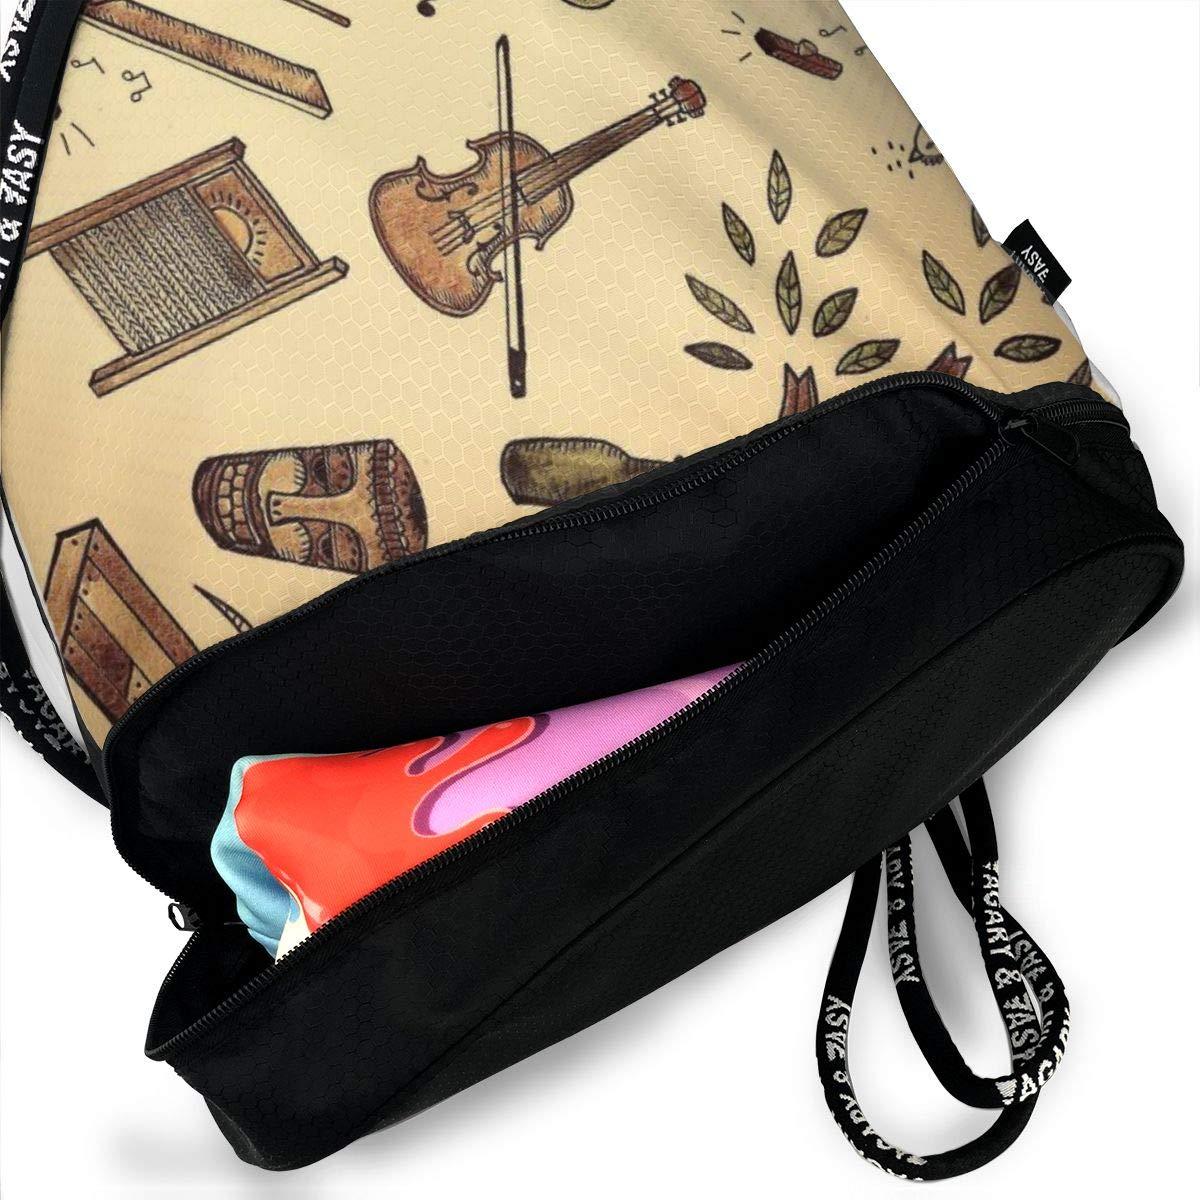 Women Old Time Music Printed Sackpack Sport Cinch Pack Backpack for Men Kji Gym Sack Drawstring Bag